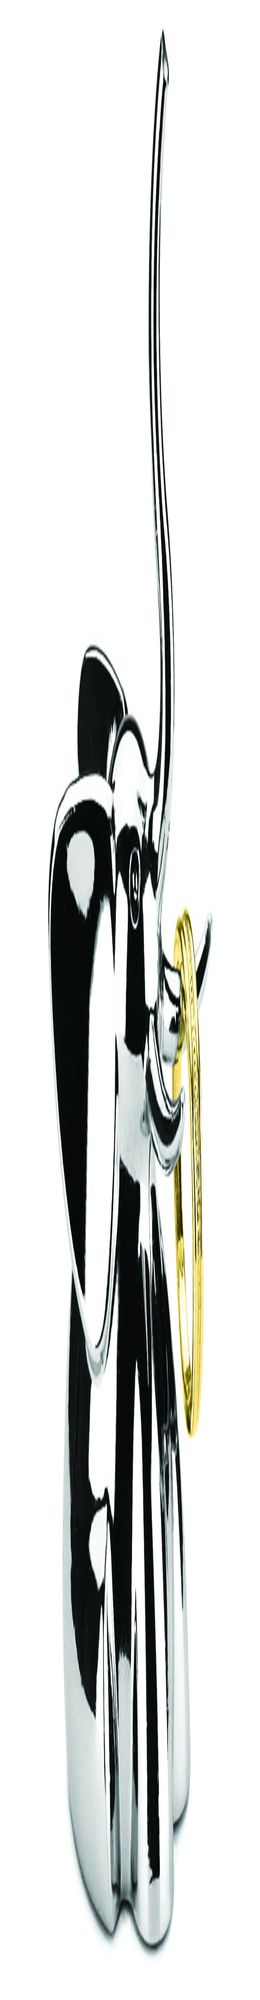 Подставка для колец Zoola Слон фото